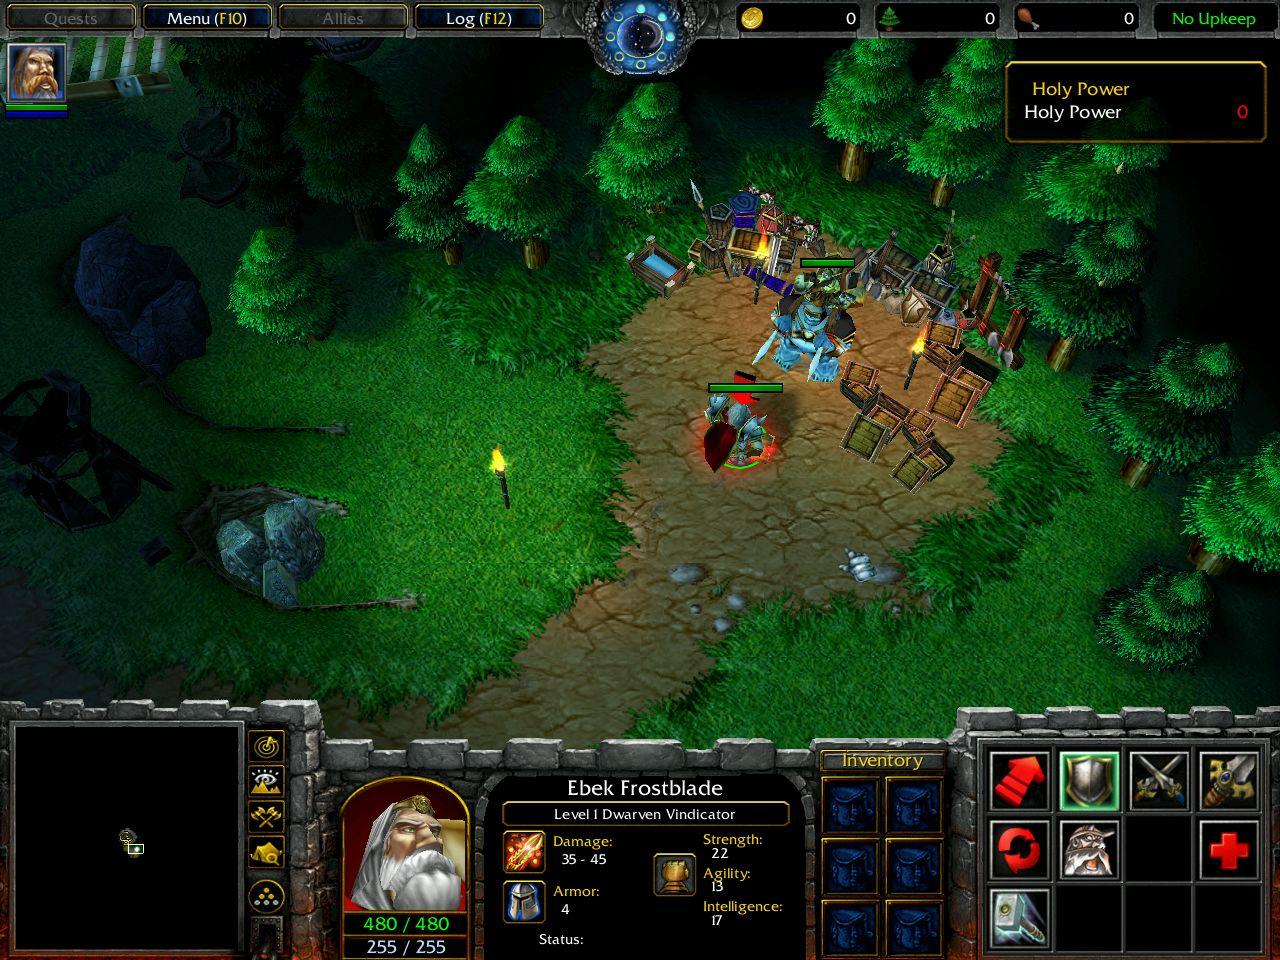 Warcraft 3 Map Project Exploration Bradjones